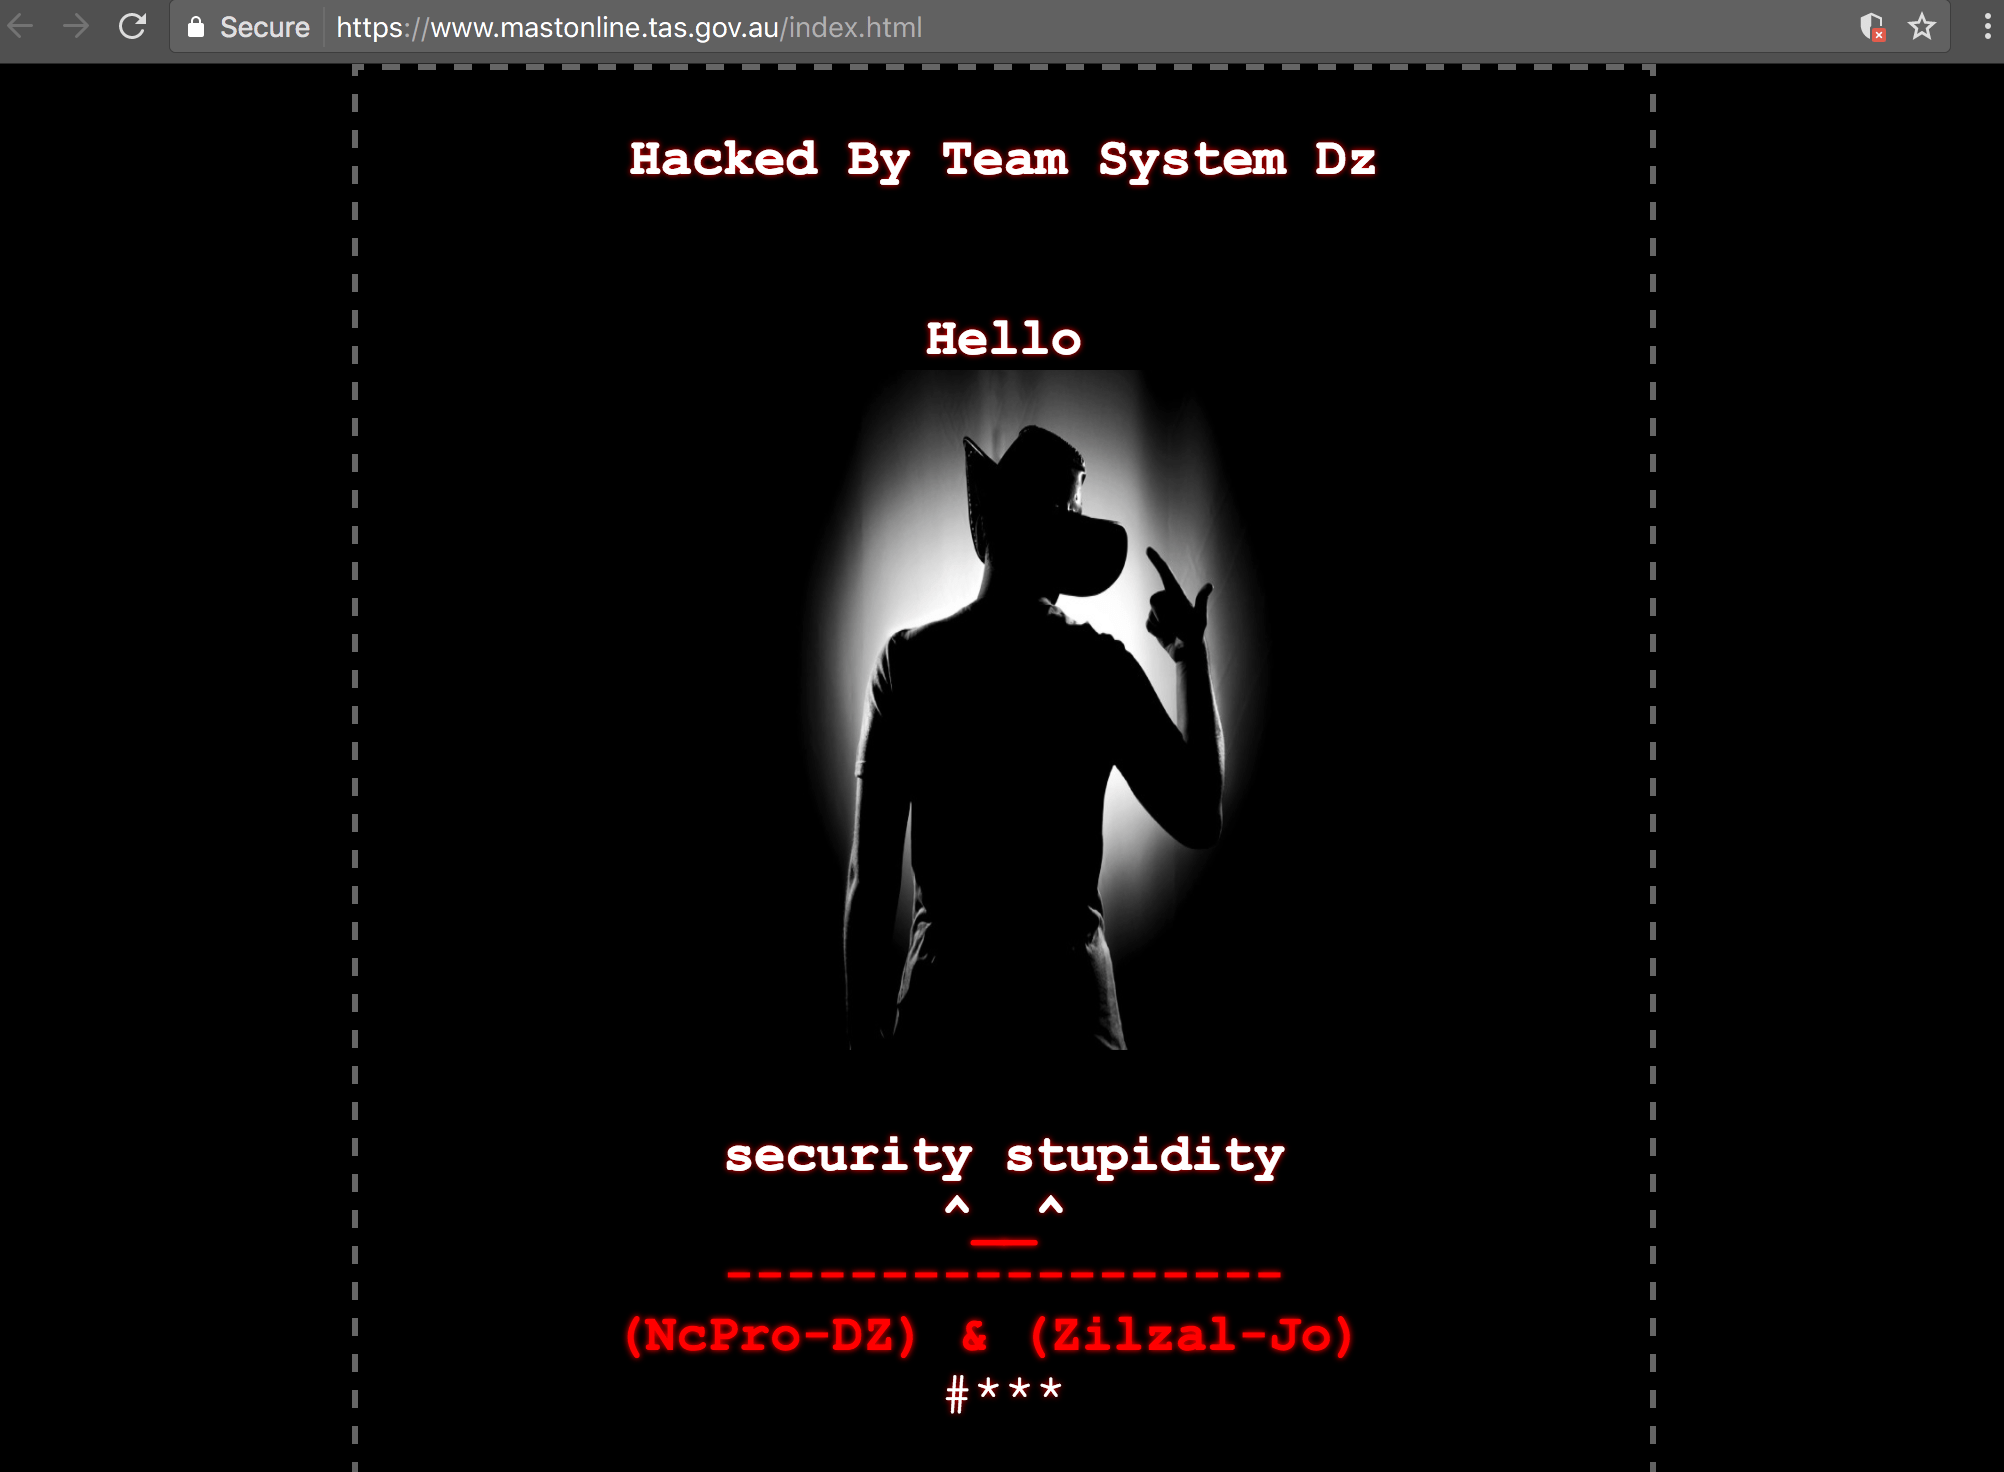 Screenshot of www.mastonline.tas.gov.au defaced by Team System Dz